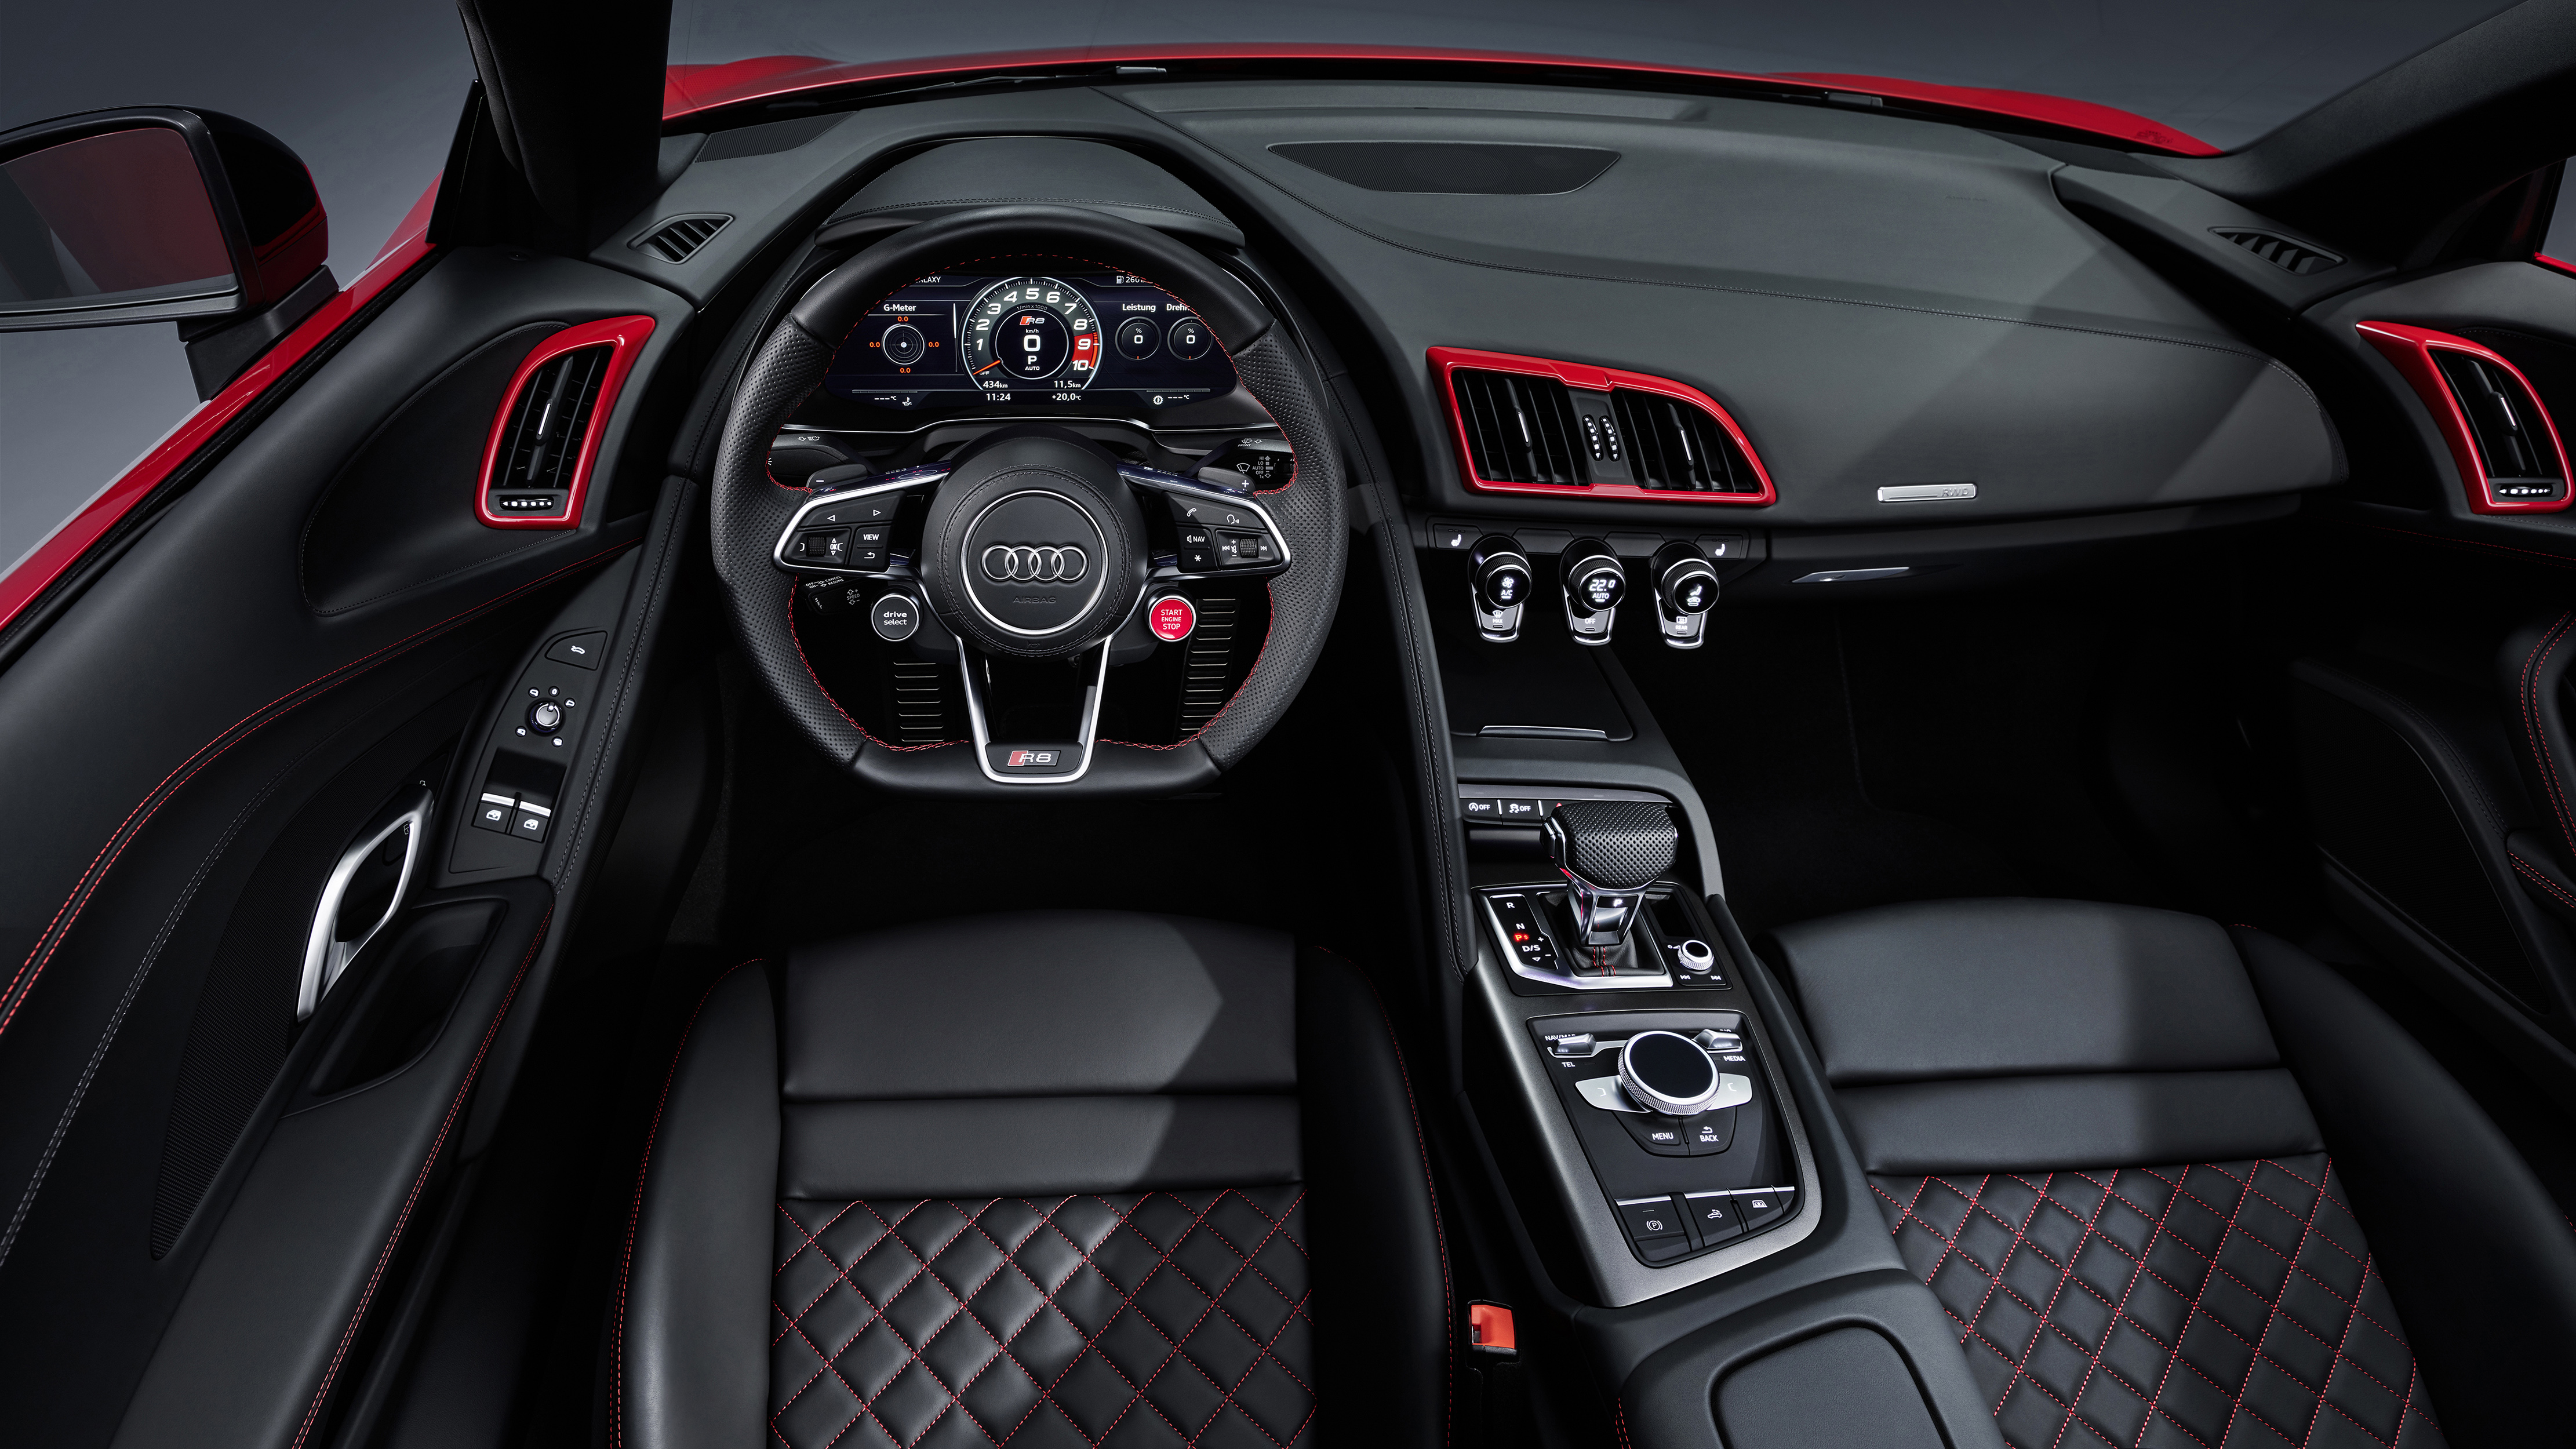 Audi R8 V10 Rwd Spyder 2019 4k Interior Wallpaper Hd Car Wallpapers Id 13600